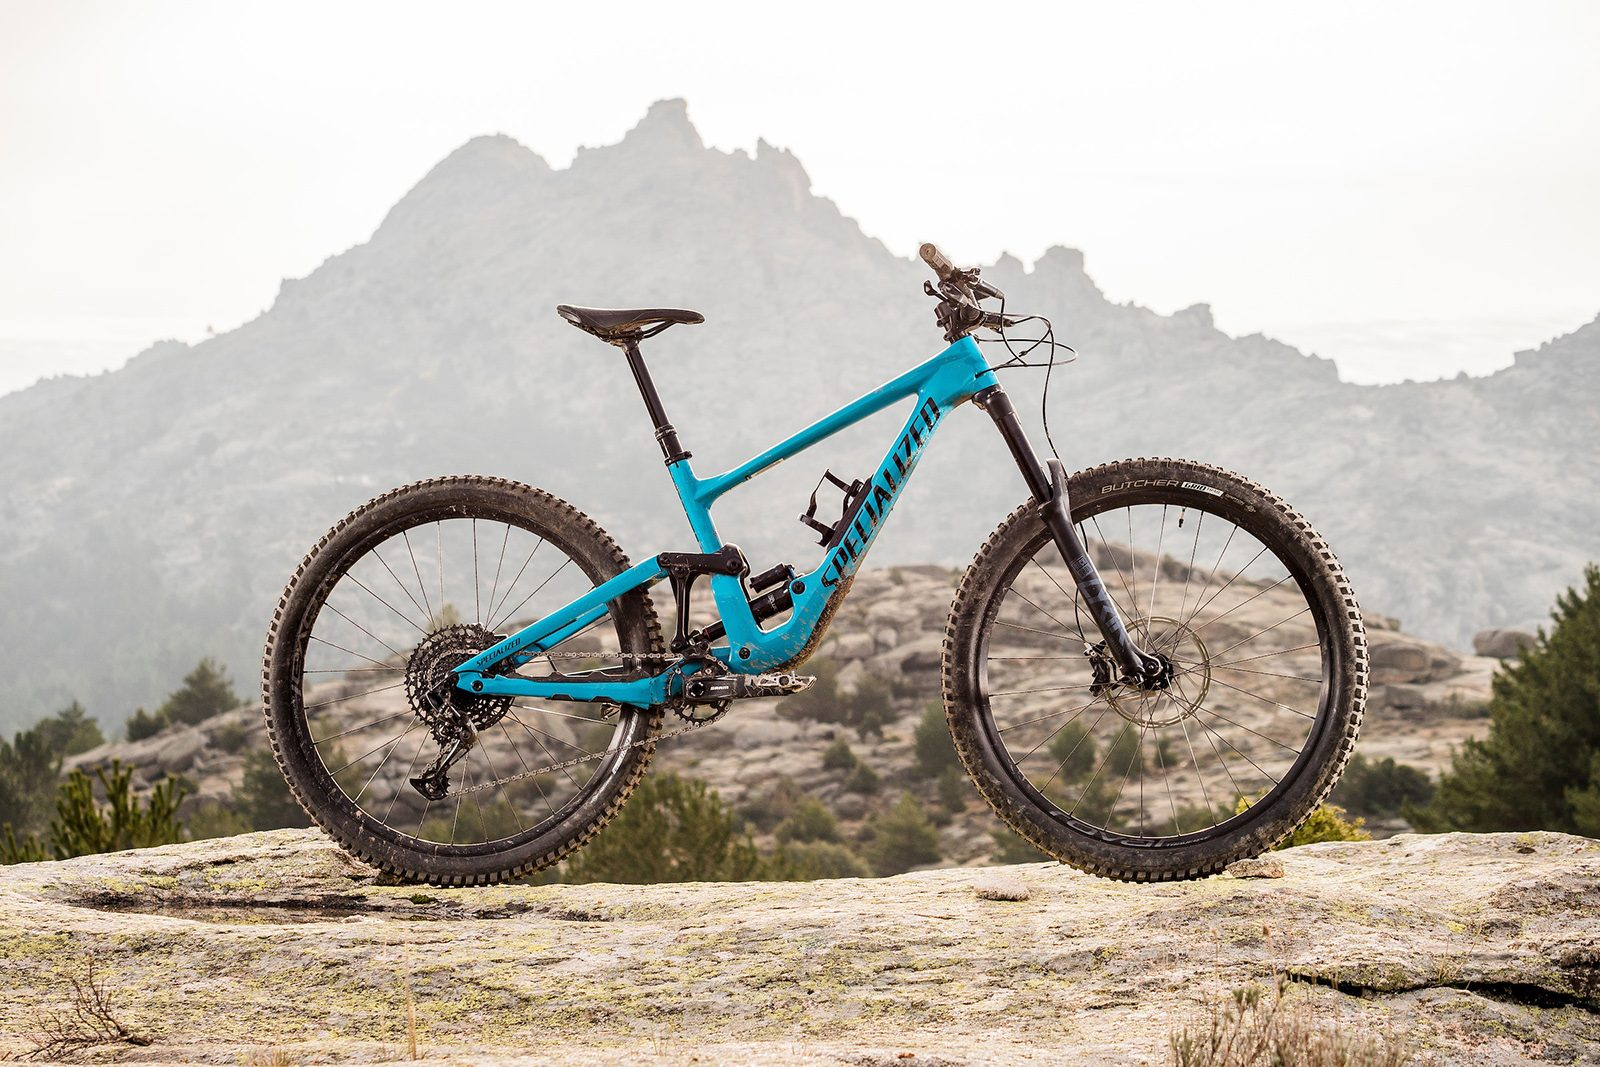 MTB//DH Carbon Downtube Protector Clear Vinyl Bike Cycling Stone Guard